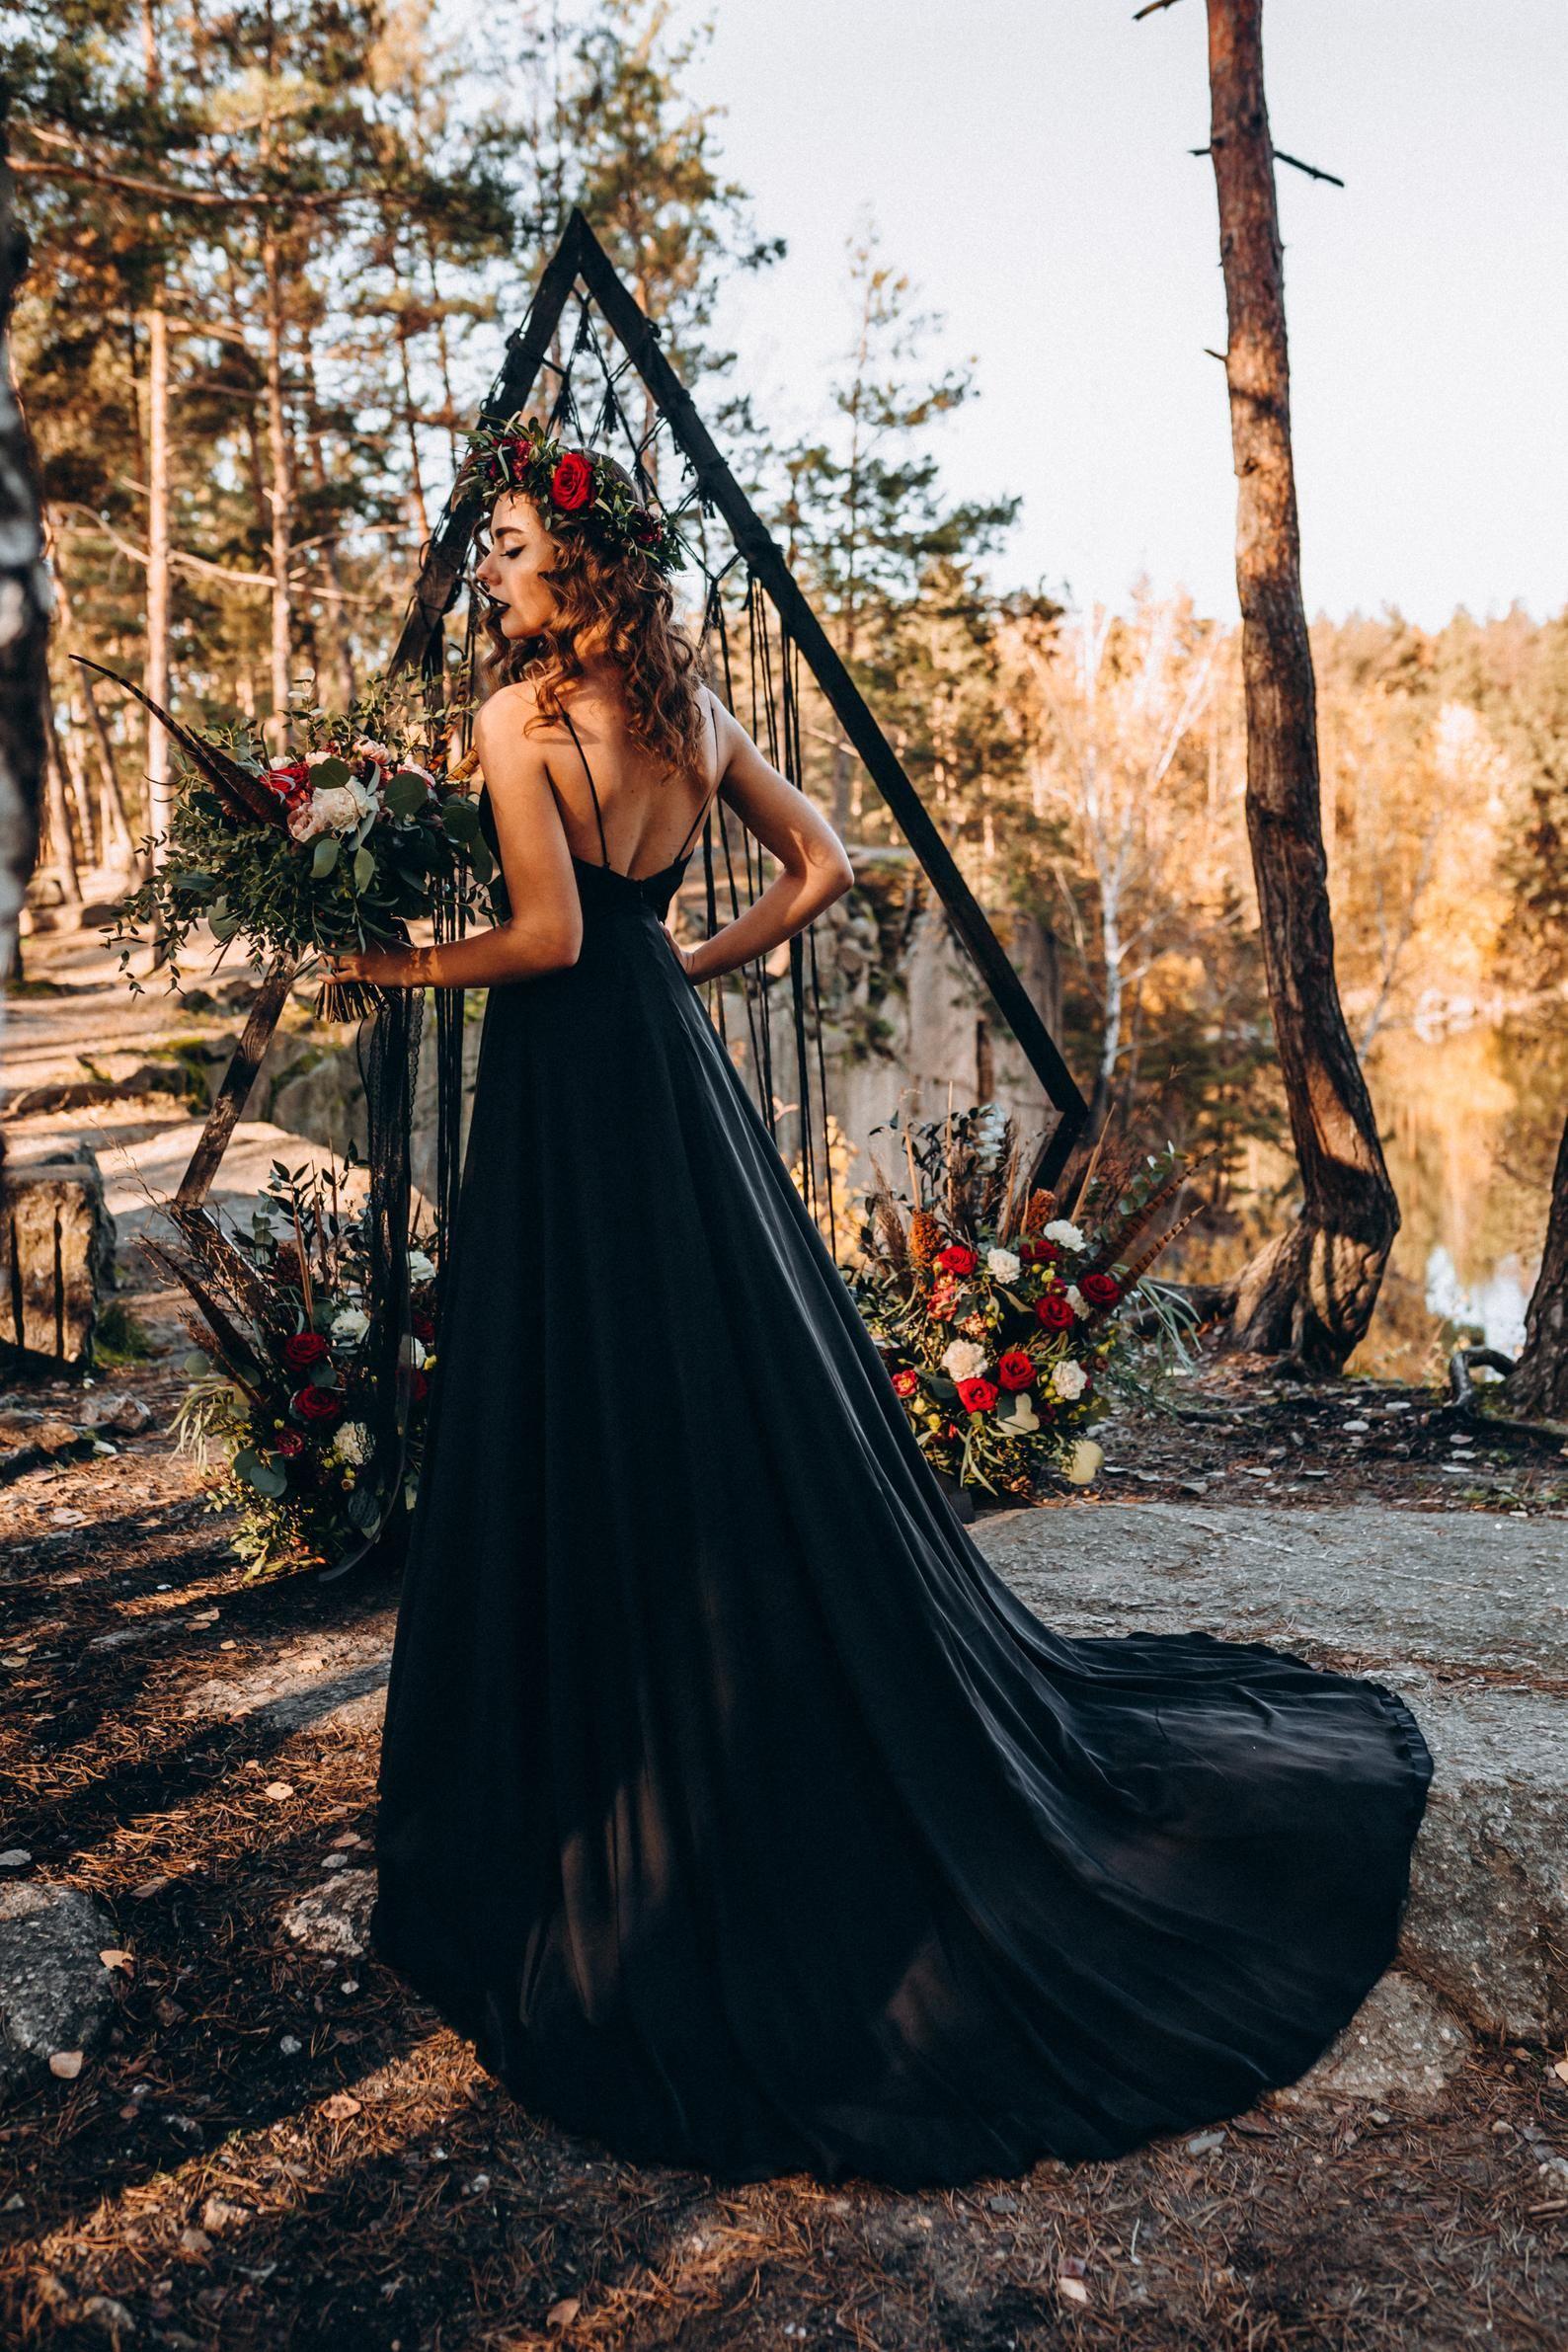 New Black Slip Dress With Huge Train Bridal Black Silk Satin Etsy Black Slip Dress Slip Dress Silk Gown [ 2382 x 1588 Pixel ]